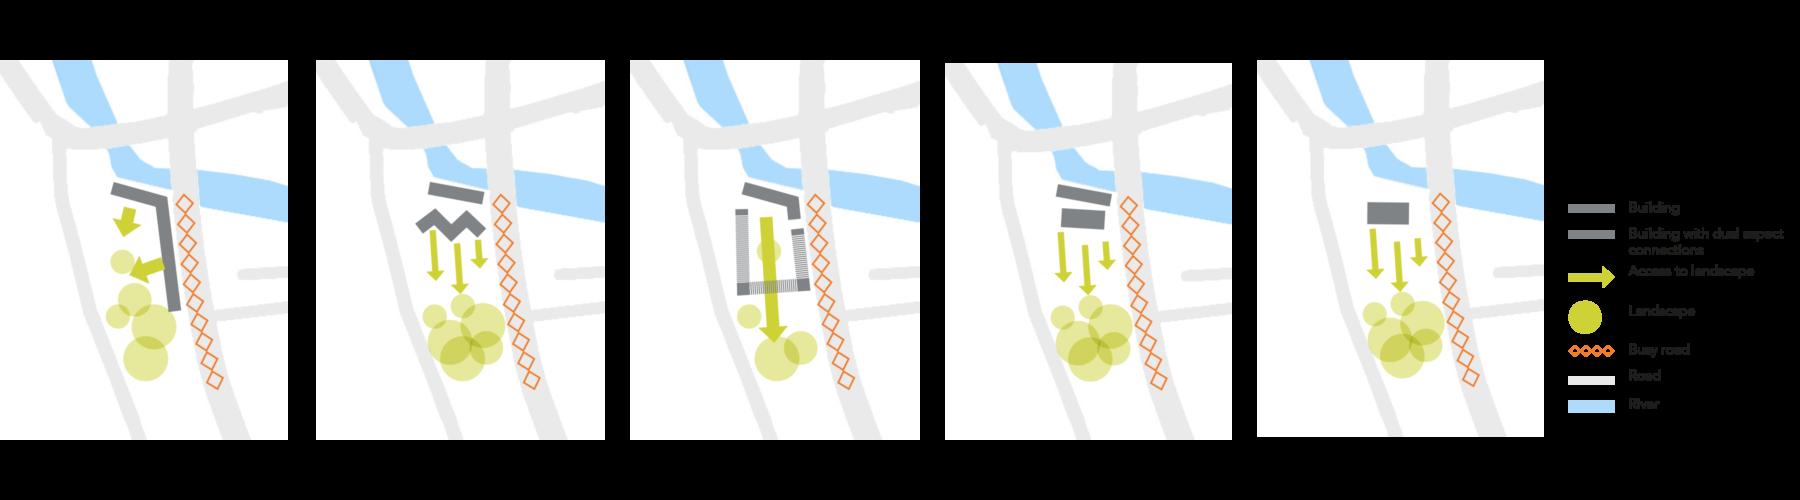 Sarah-Wigglesworth-Architects Portland-Nursery Process-Diagrams 3600